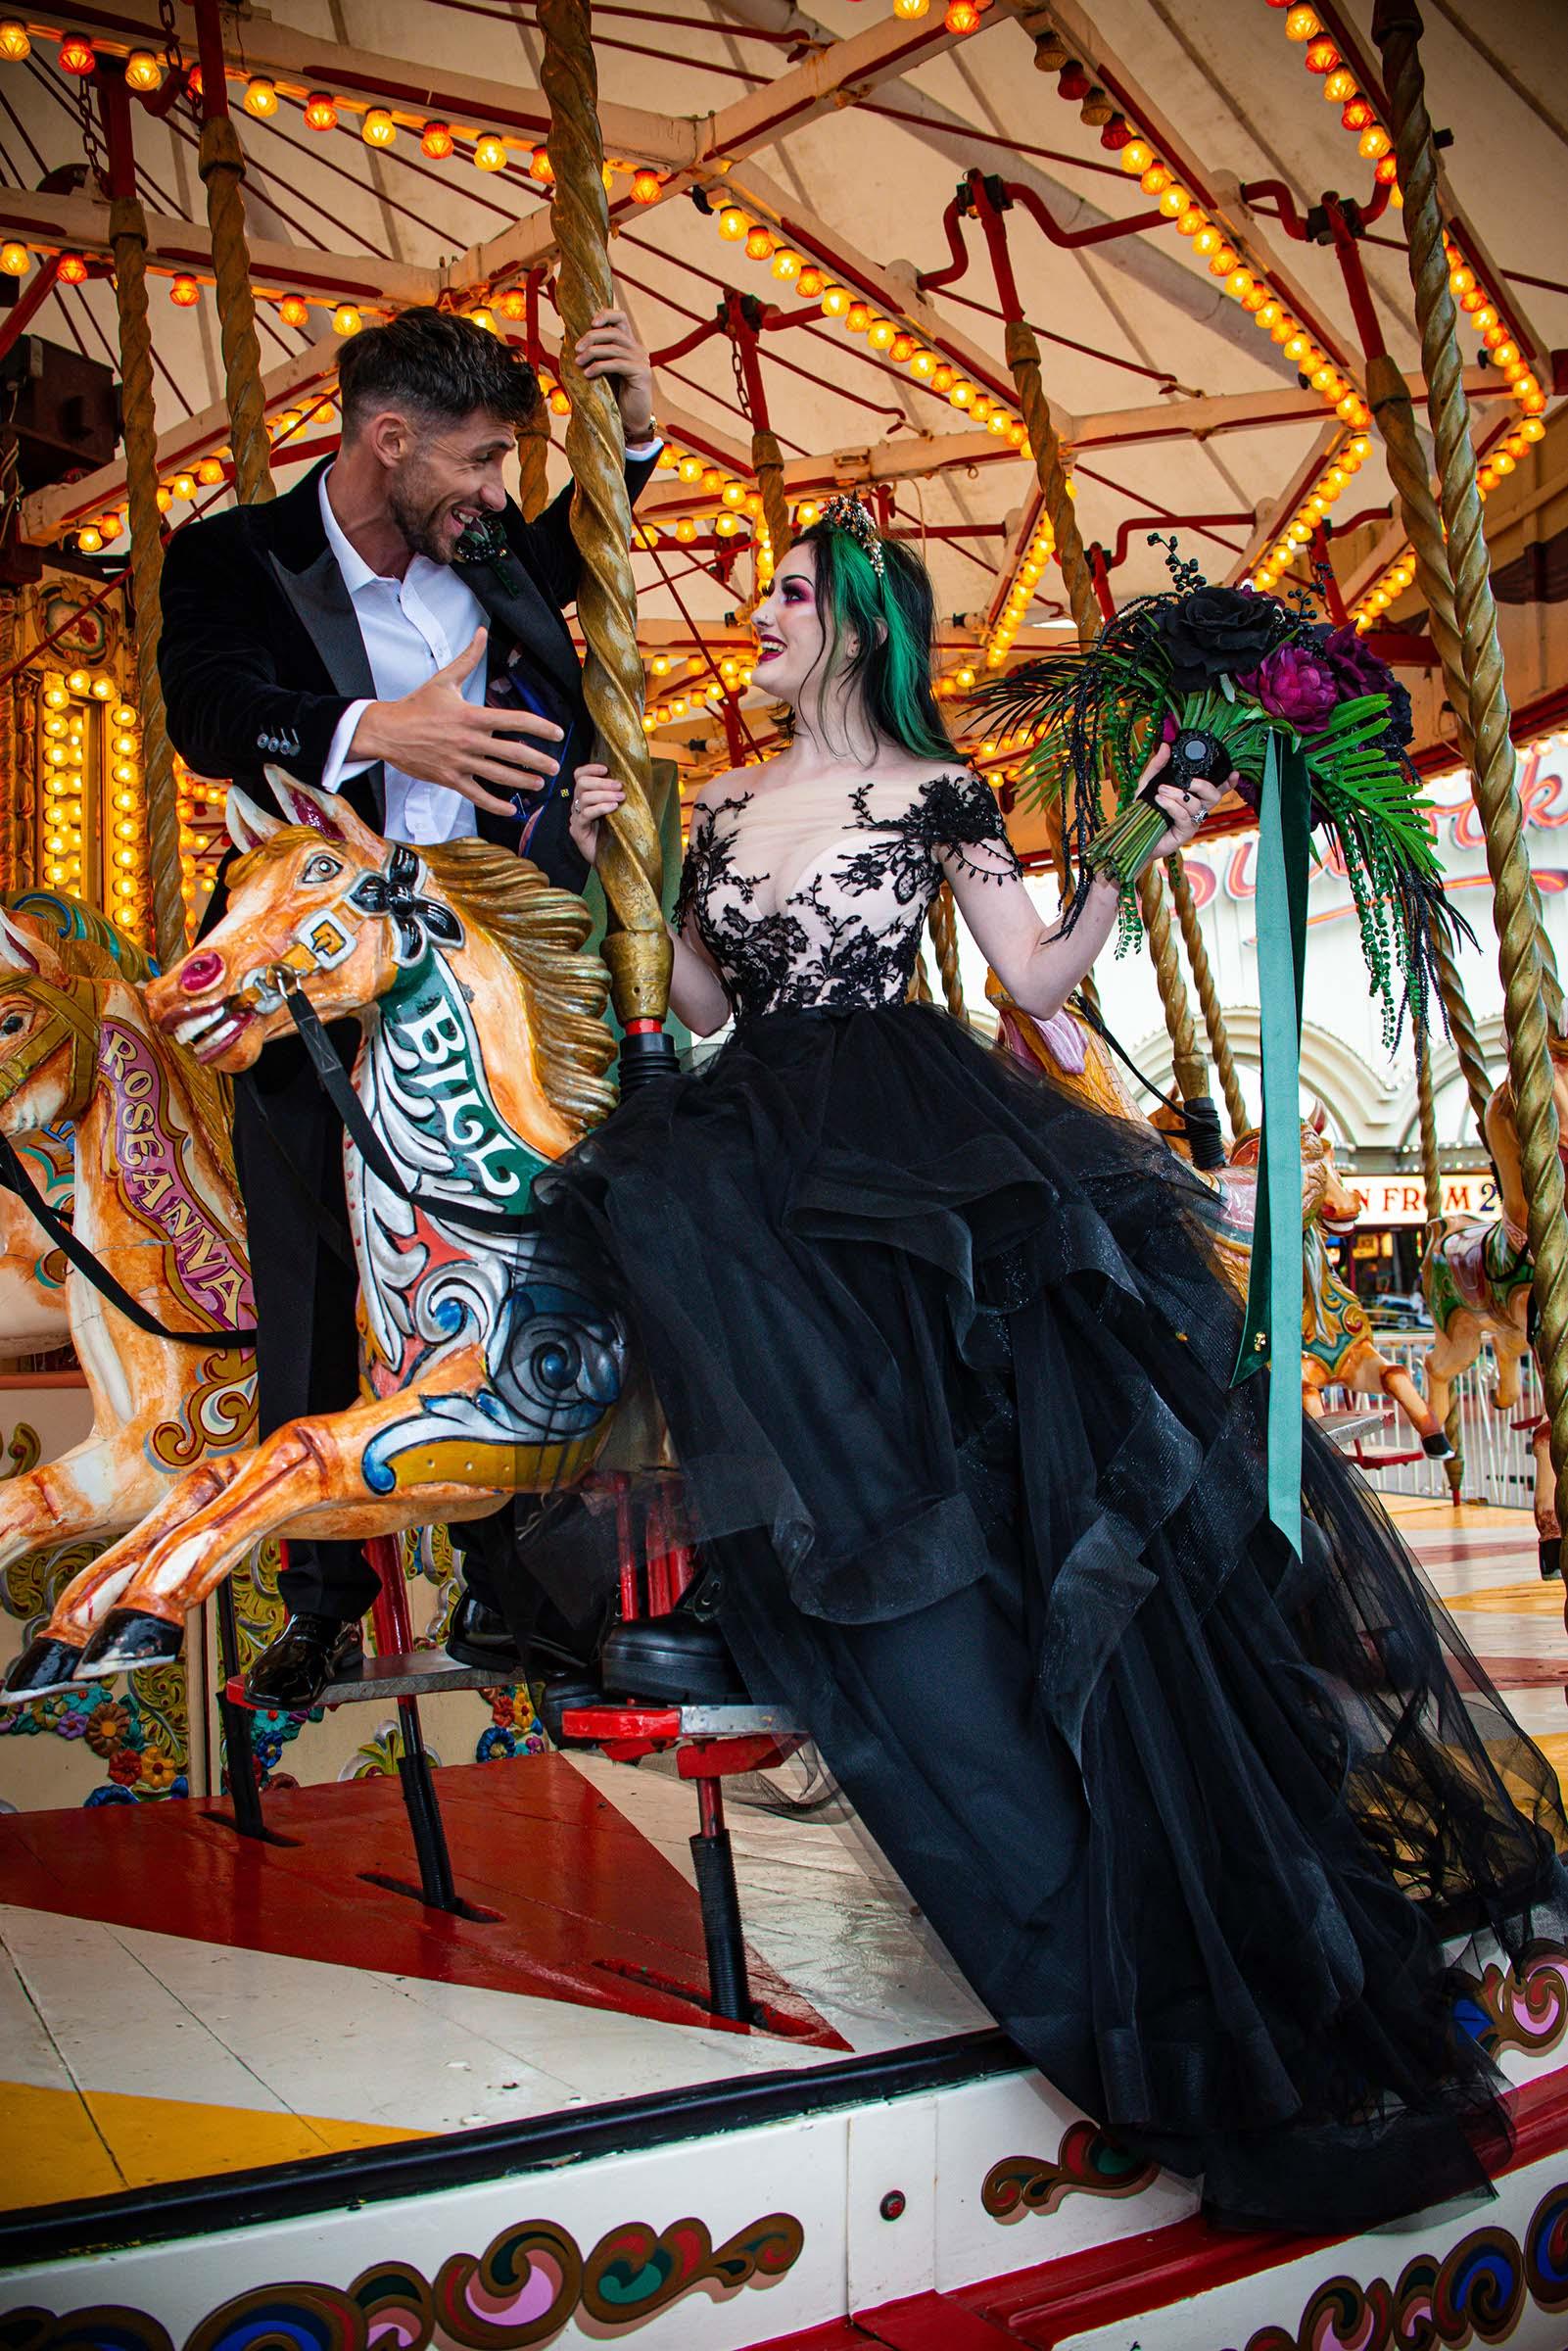 alternative luxe wedding - slytherin wedding - gothic wedding - alternative wedding - fun wedding ideas - bride and groom on carousel